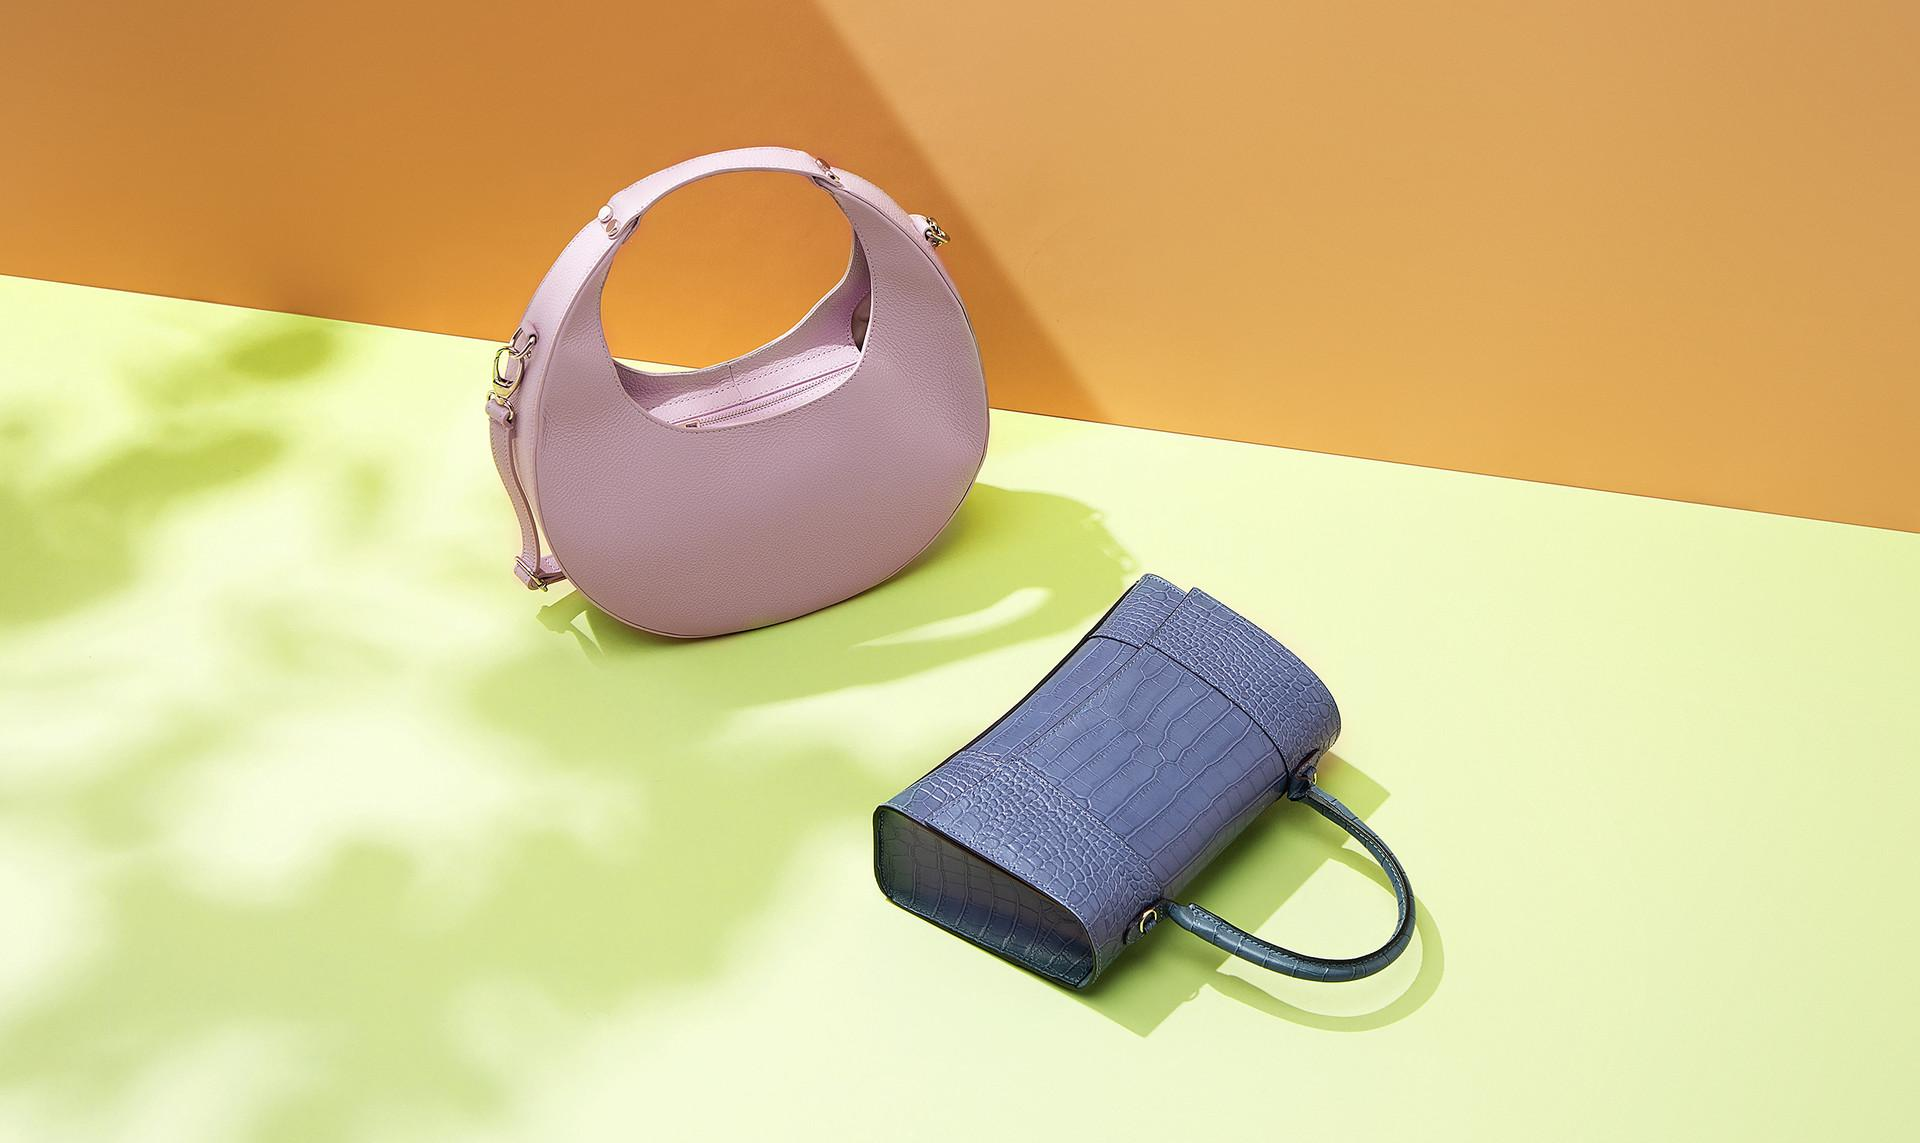 MODE FOURRURE Bag for Women